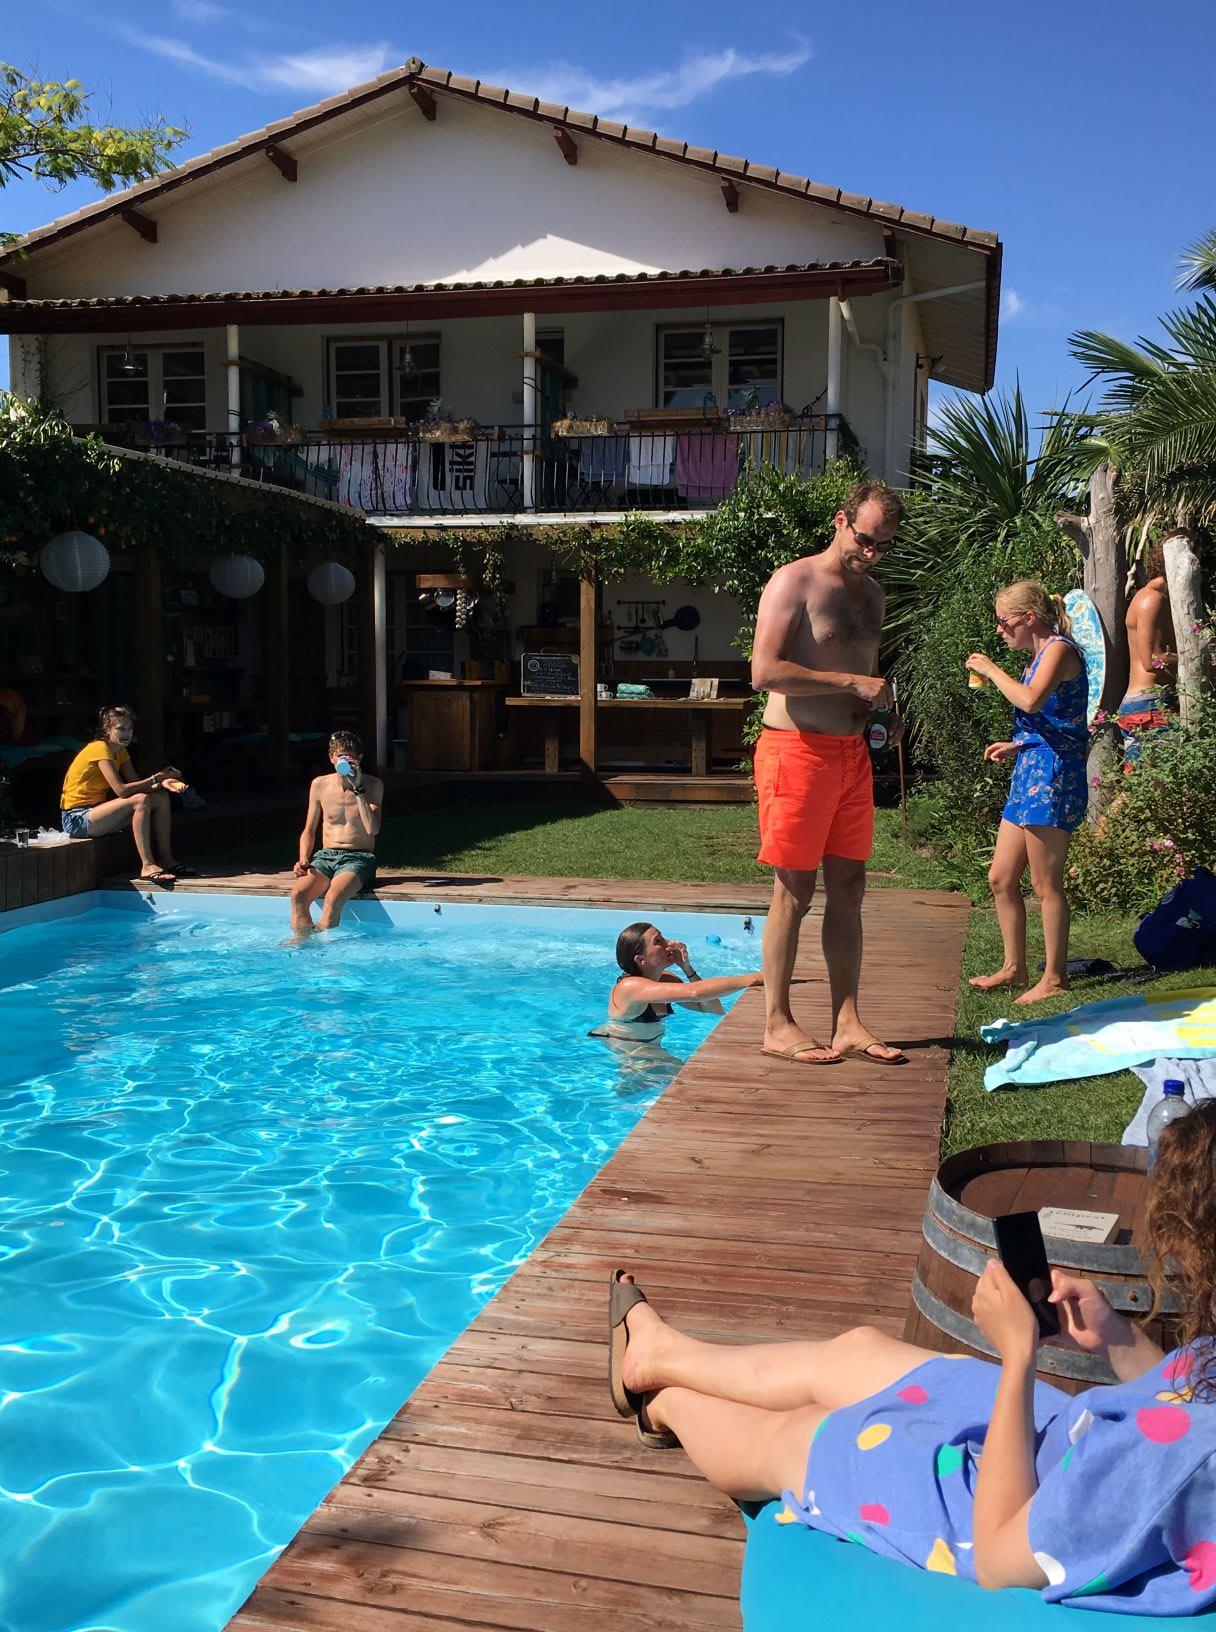 zwembad pura vida lodge